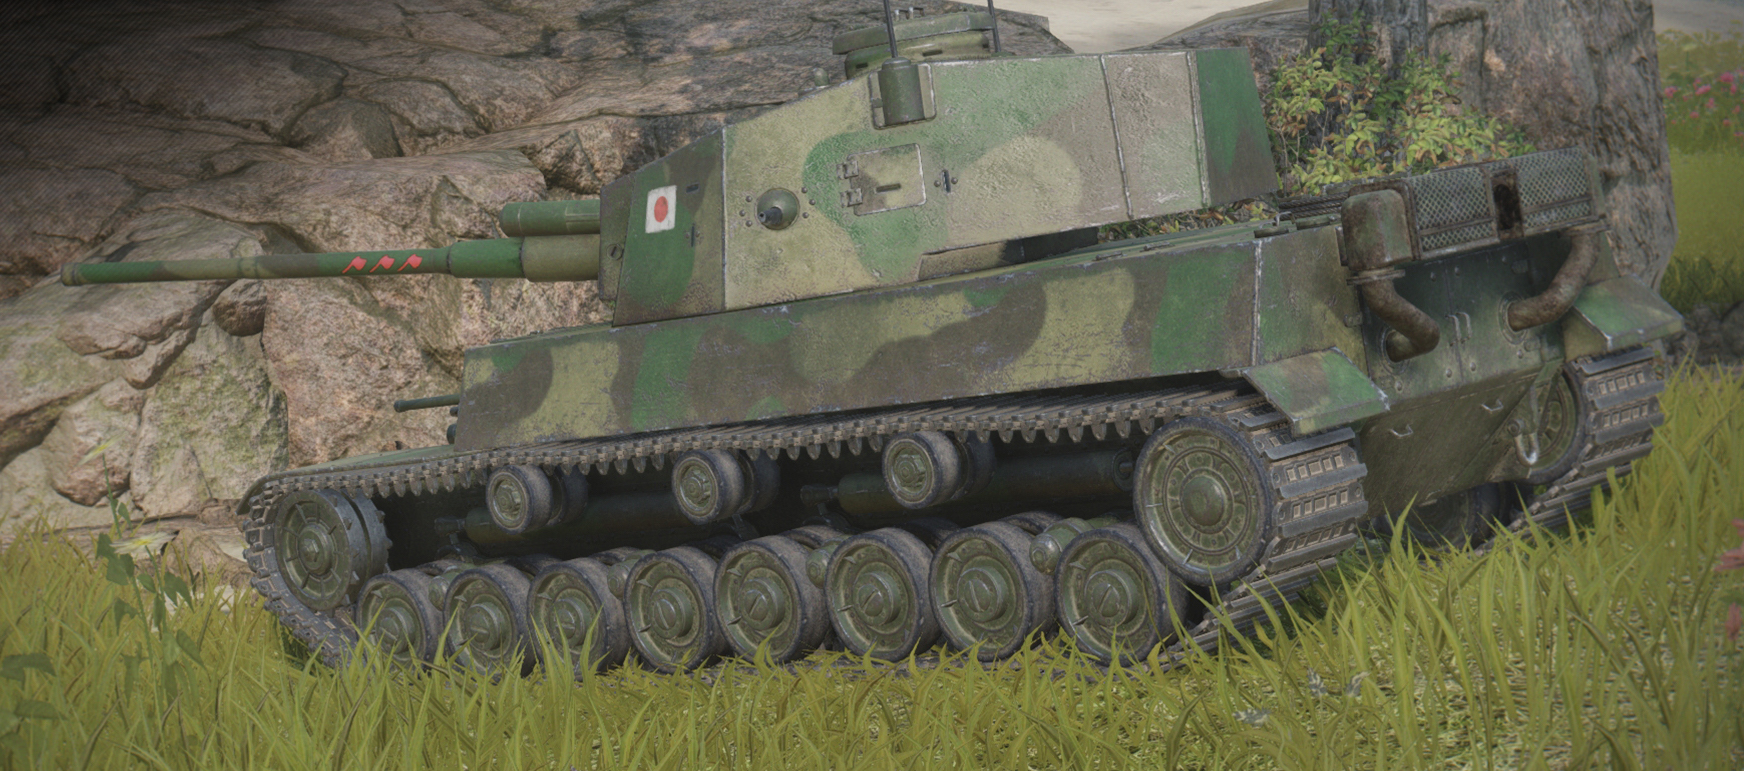 Latest World Of Tanks Xbox Update Adds New Barrel Art Tanks Hardcore Gamer